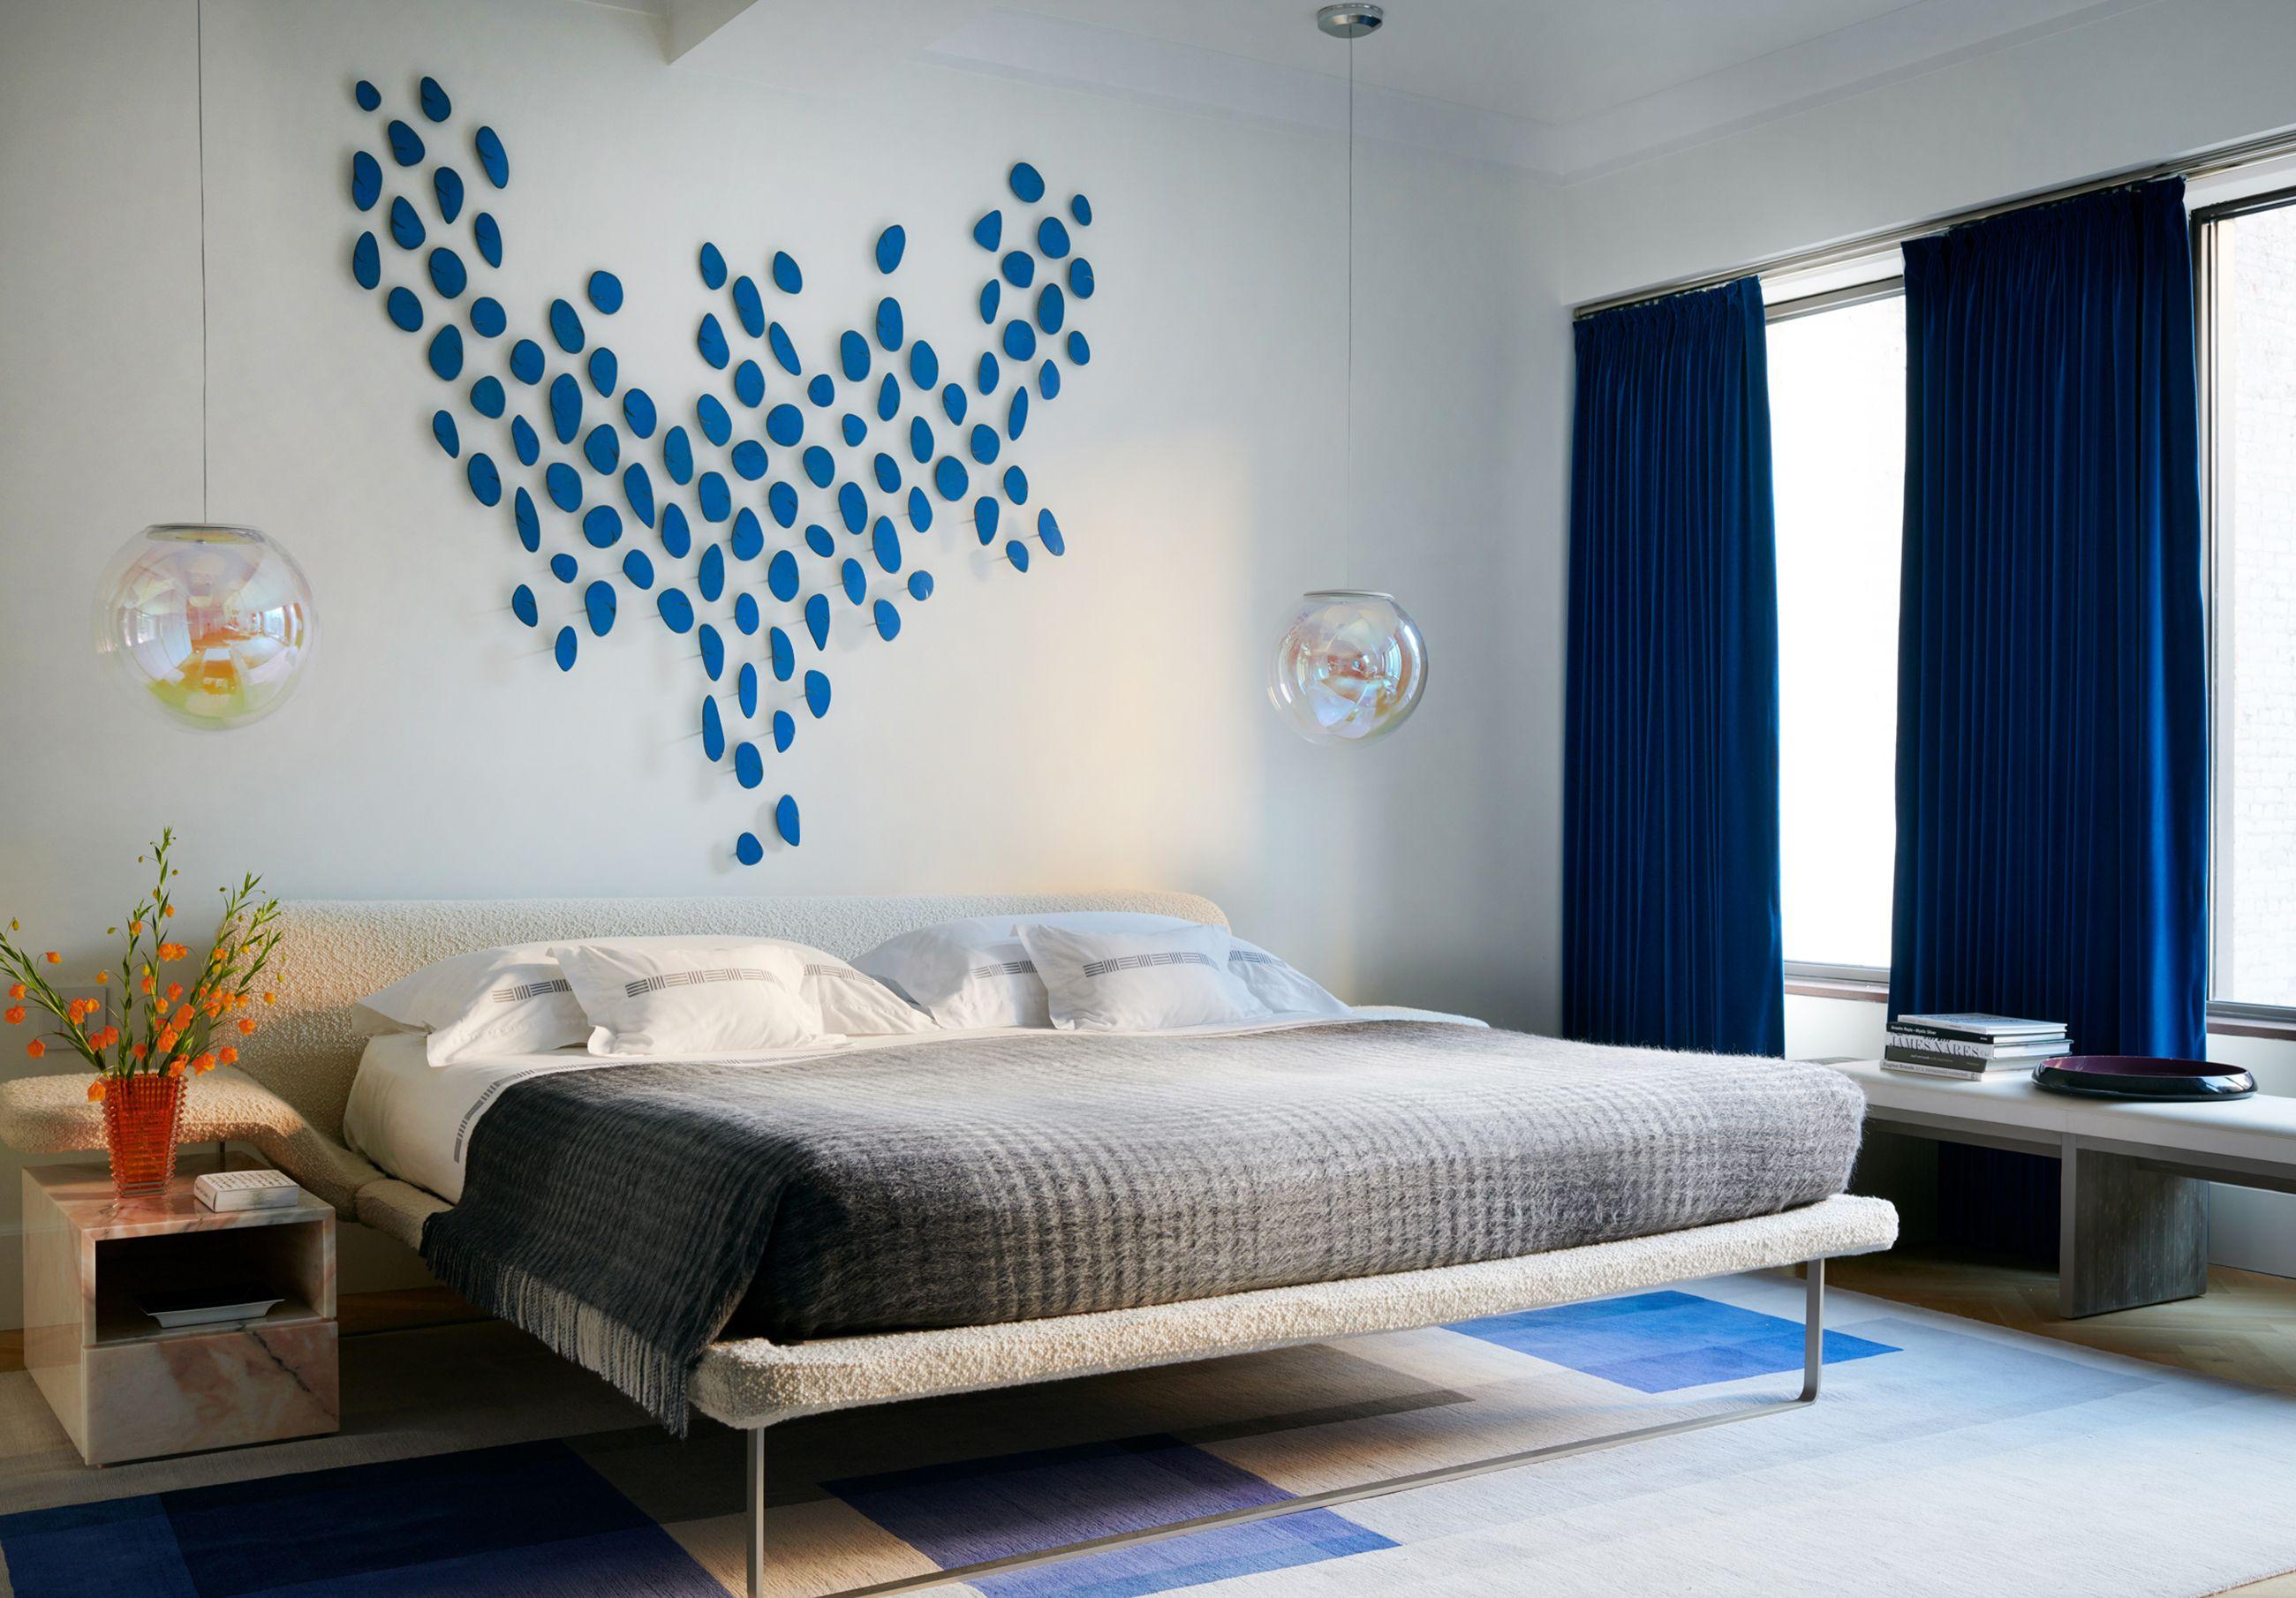 13 Inspiring Modern Bedroom Ideas - Best Modern Bedroom Designs